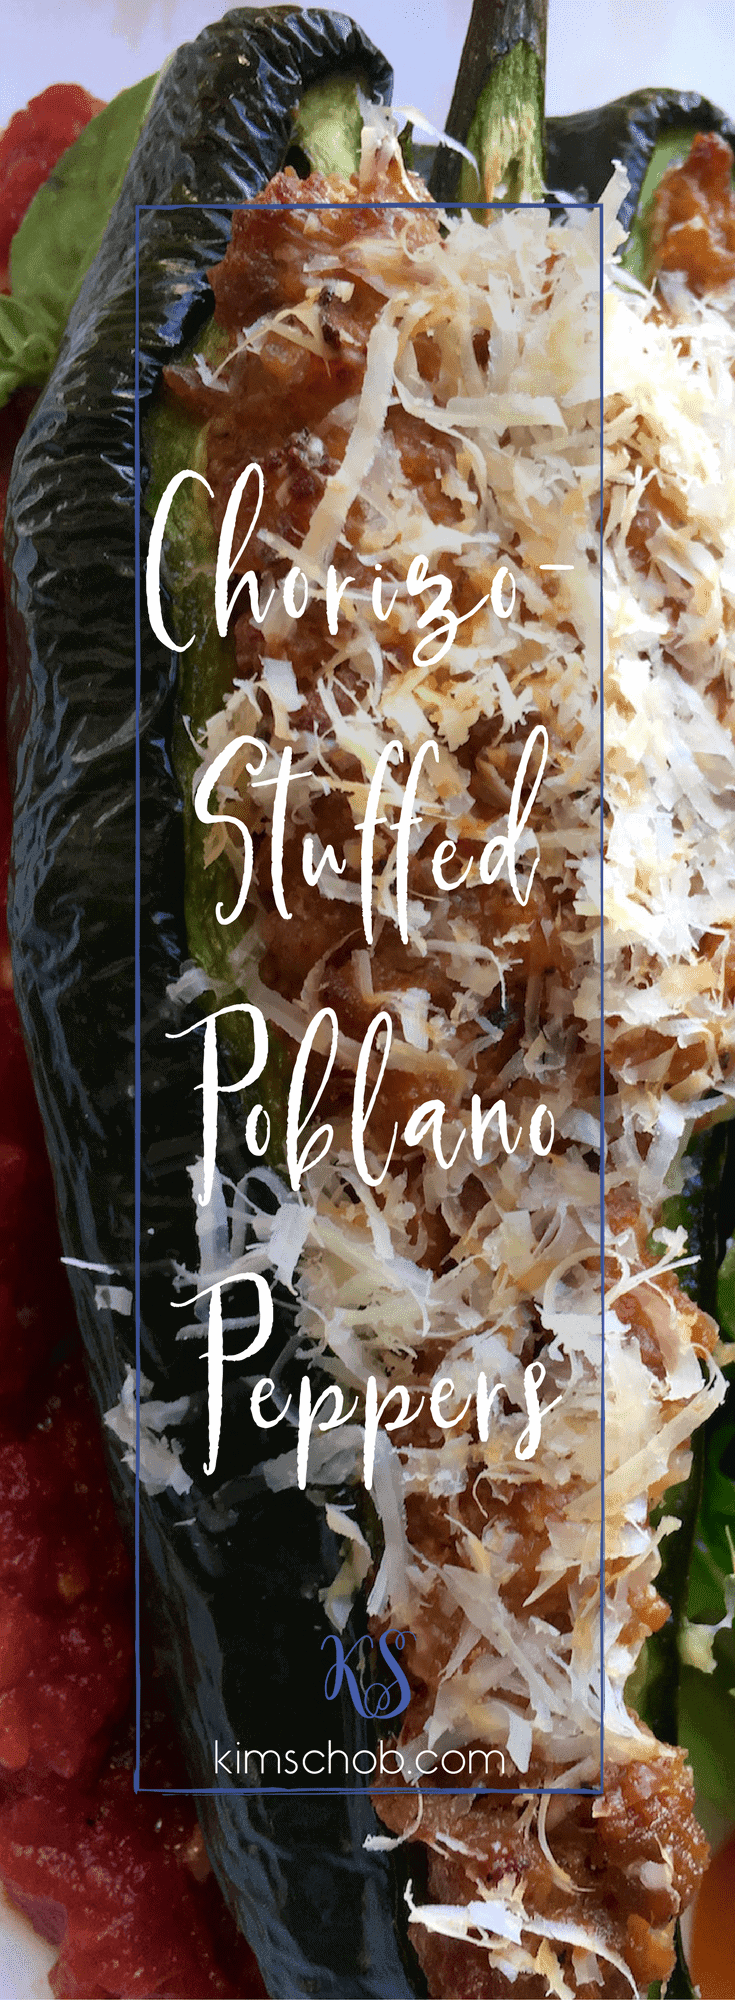 Chorizo-Stuffed Poblano Peppers| #chorizostuffedpoblanopeppers #kimschob